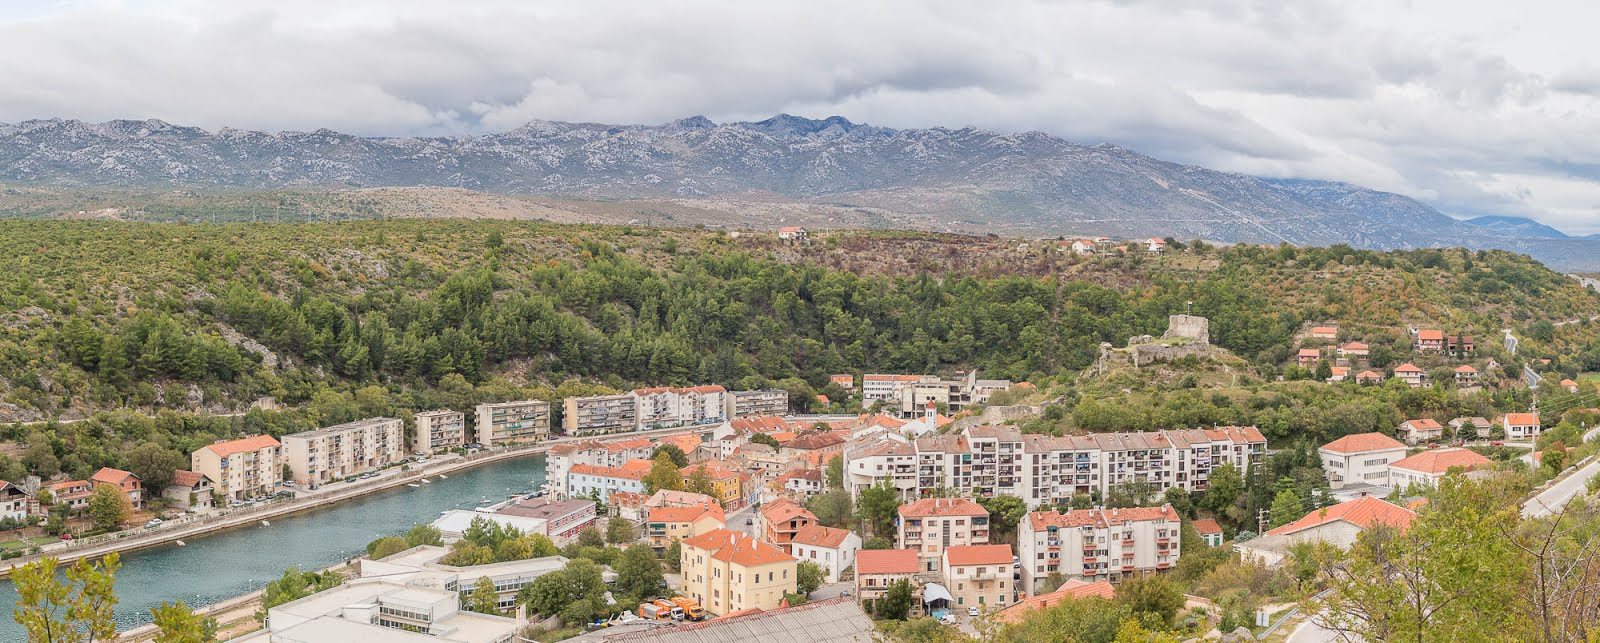 Zrmanja rivière Croatie